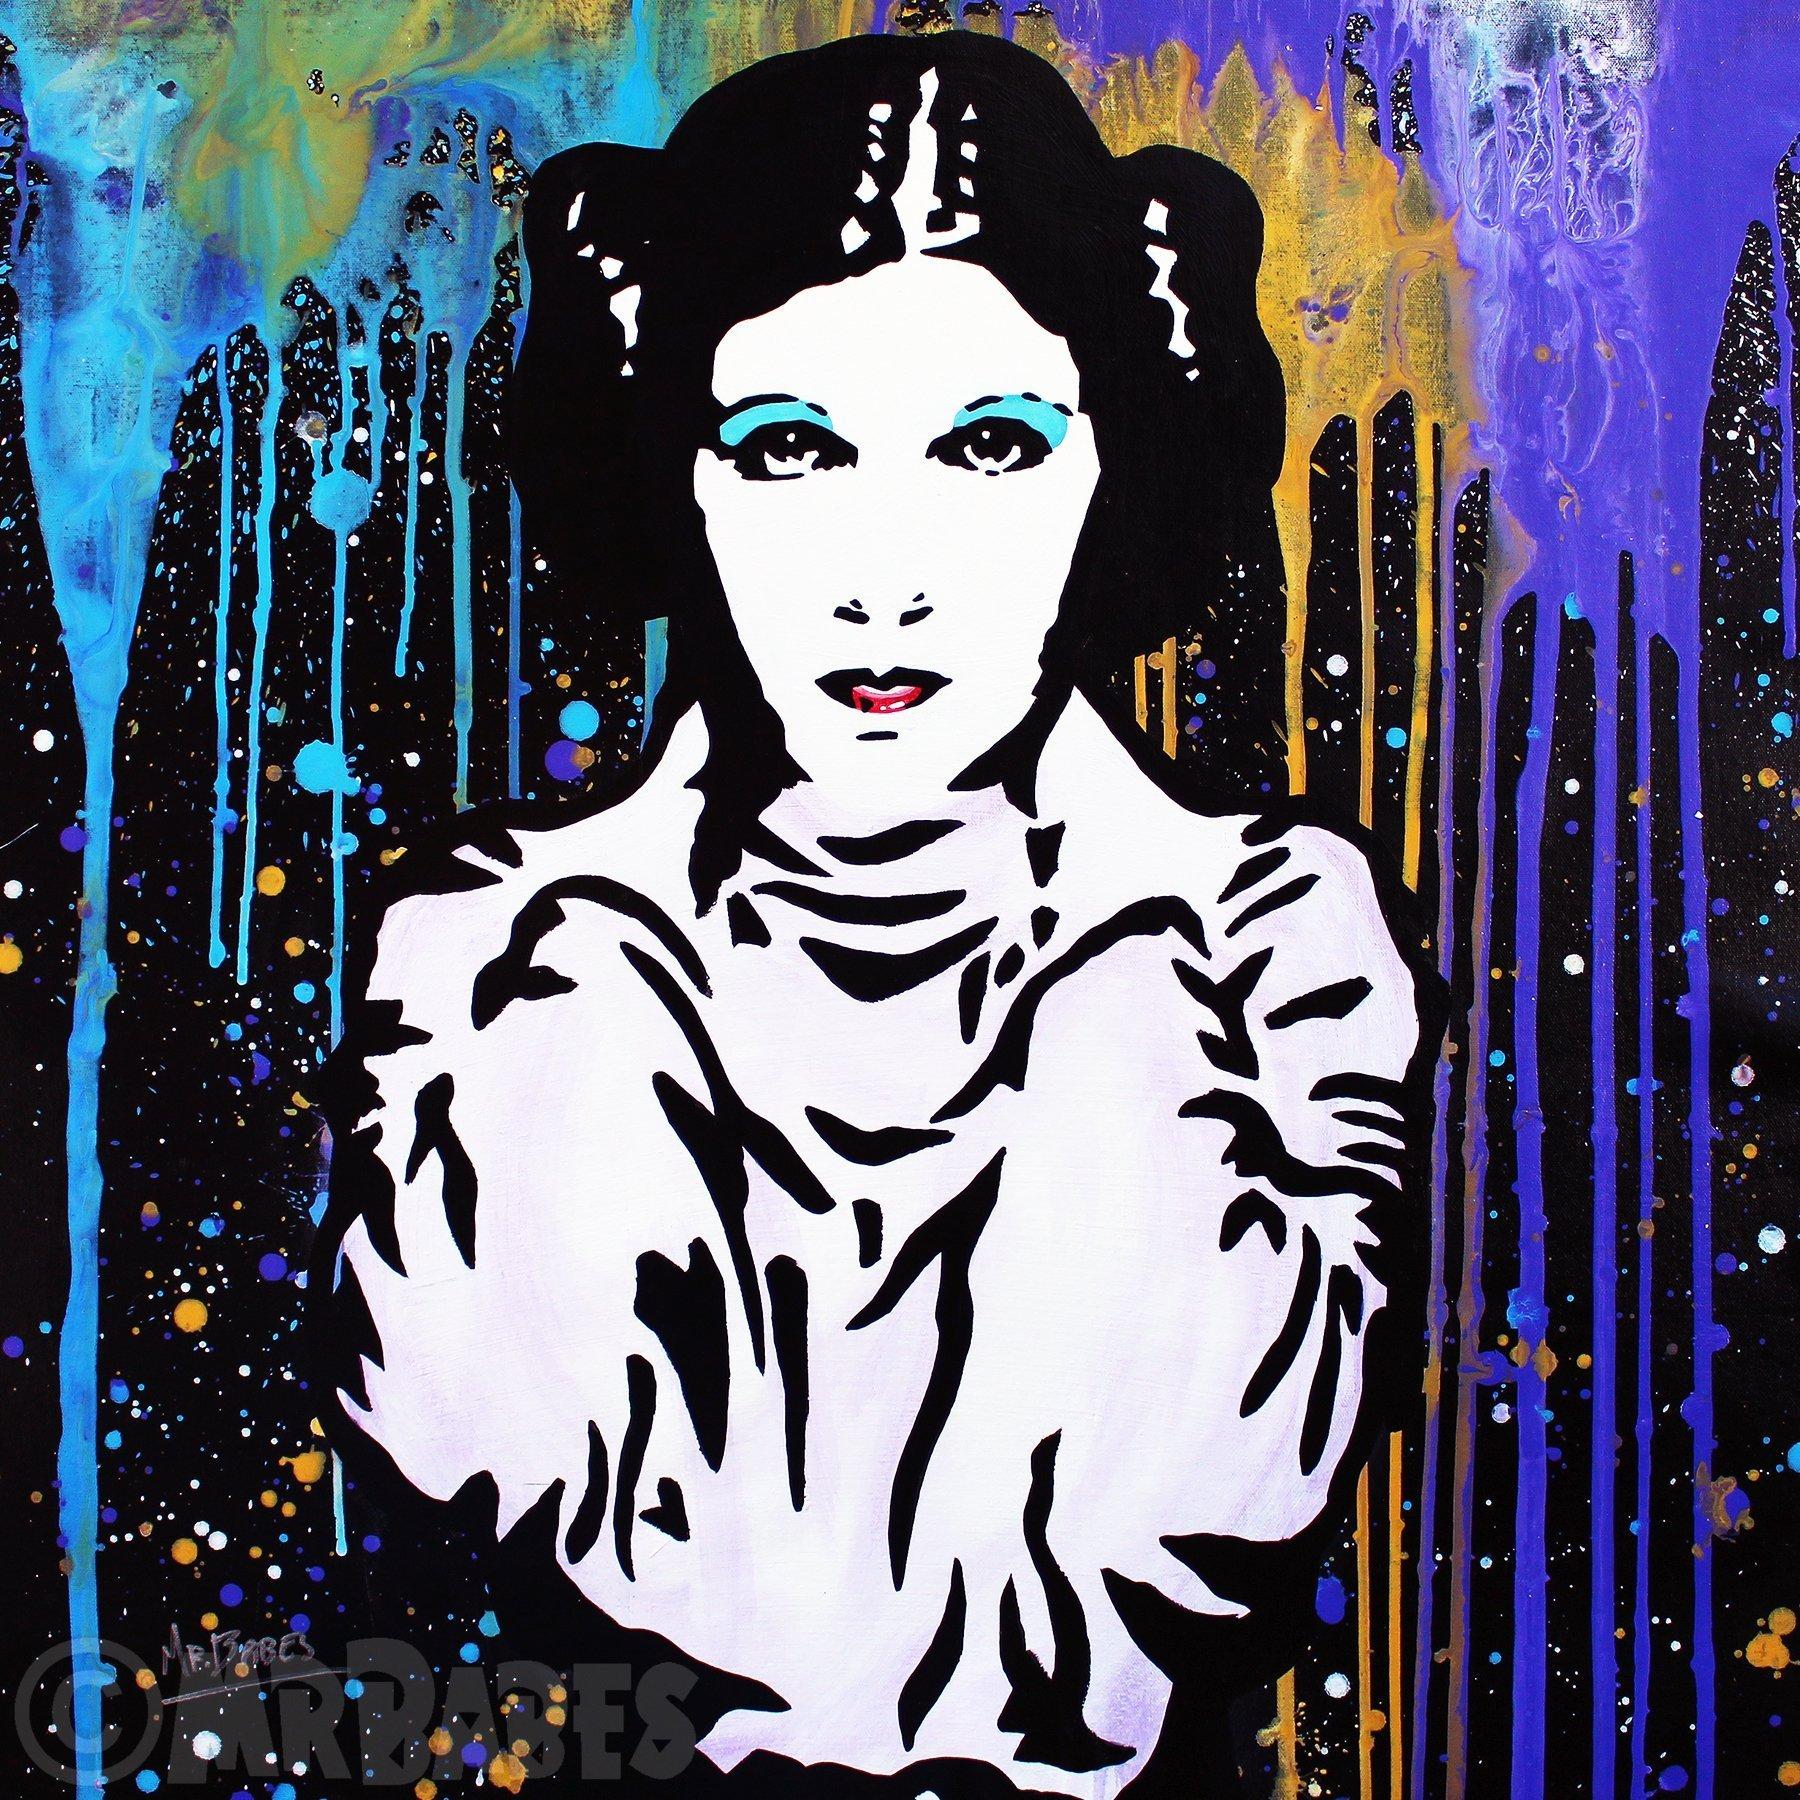 MR.BABES - ''Star Wars: Princess Leia Organa (Carrie Fisher)'' - Original Pop Art Painting - Movie Portrait